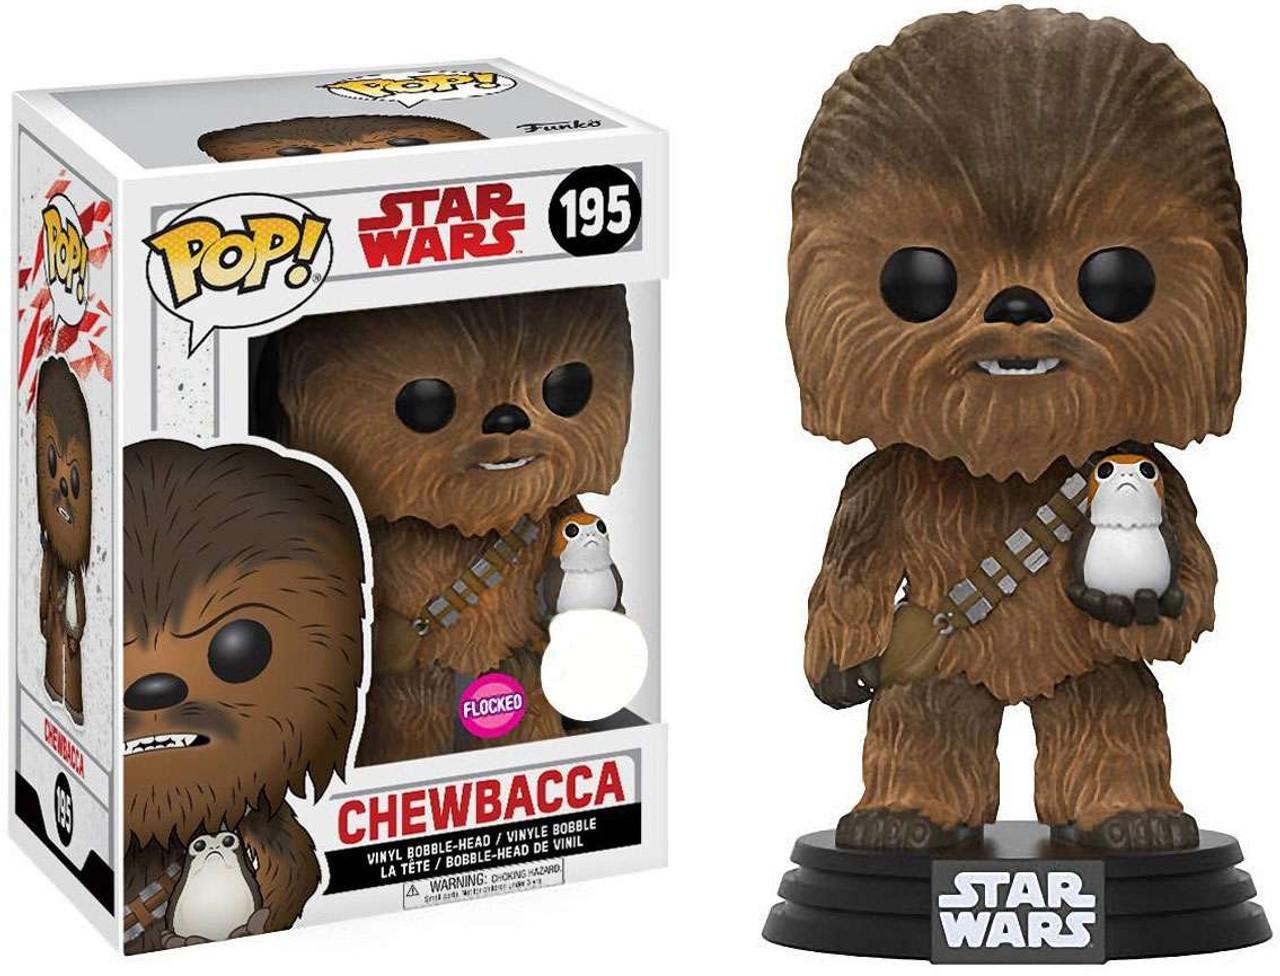 Exclusive NEW Funko POP Star Wars Chewbacca #63 Flocked